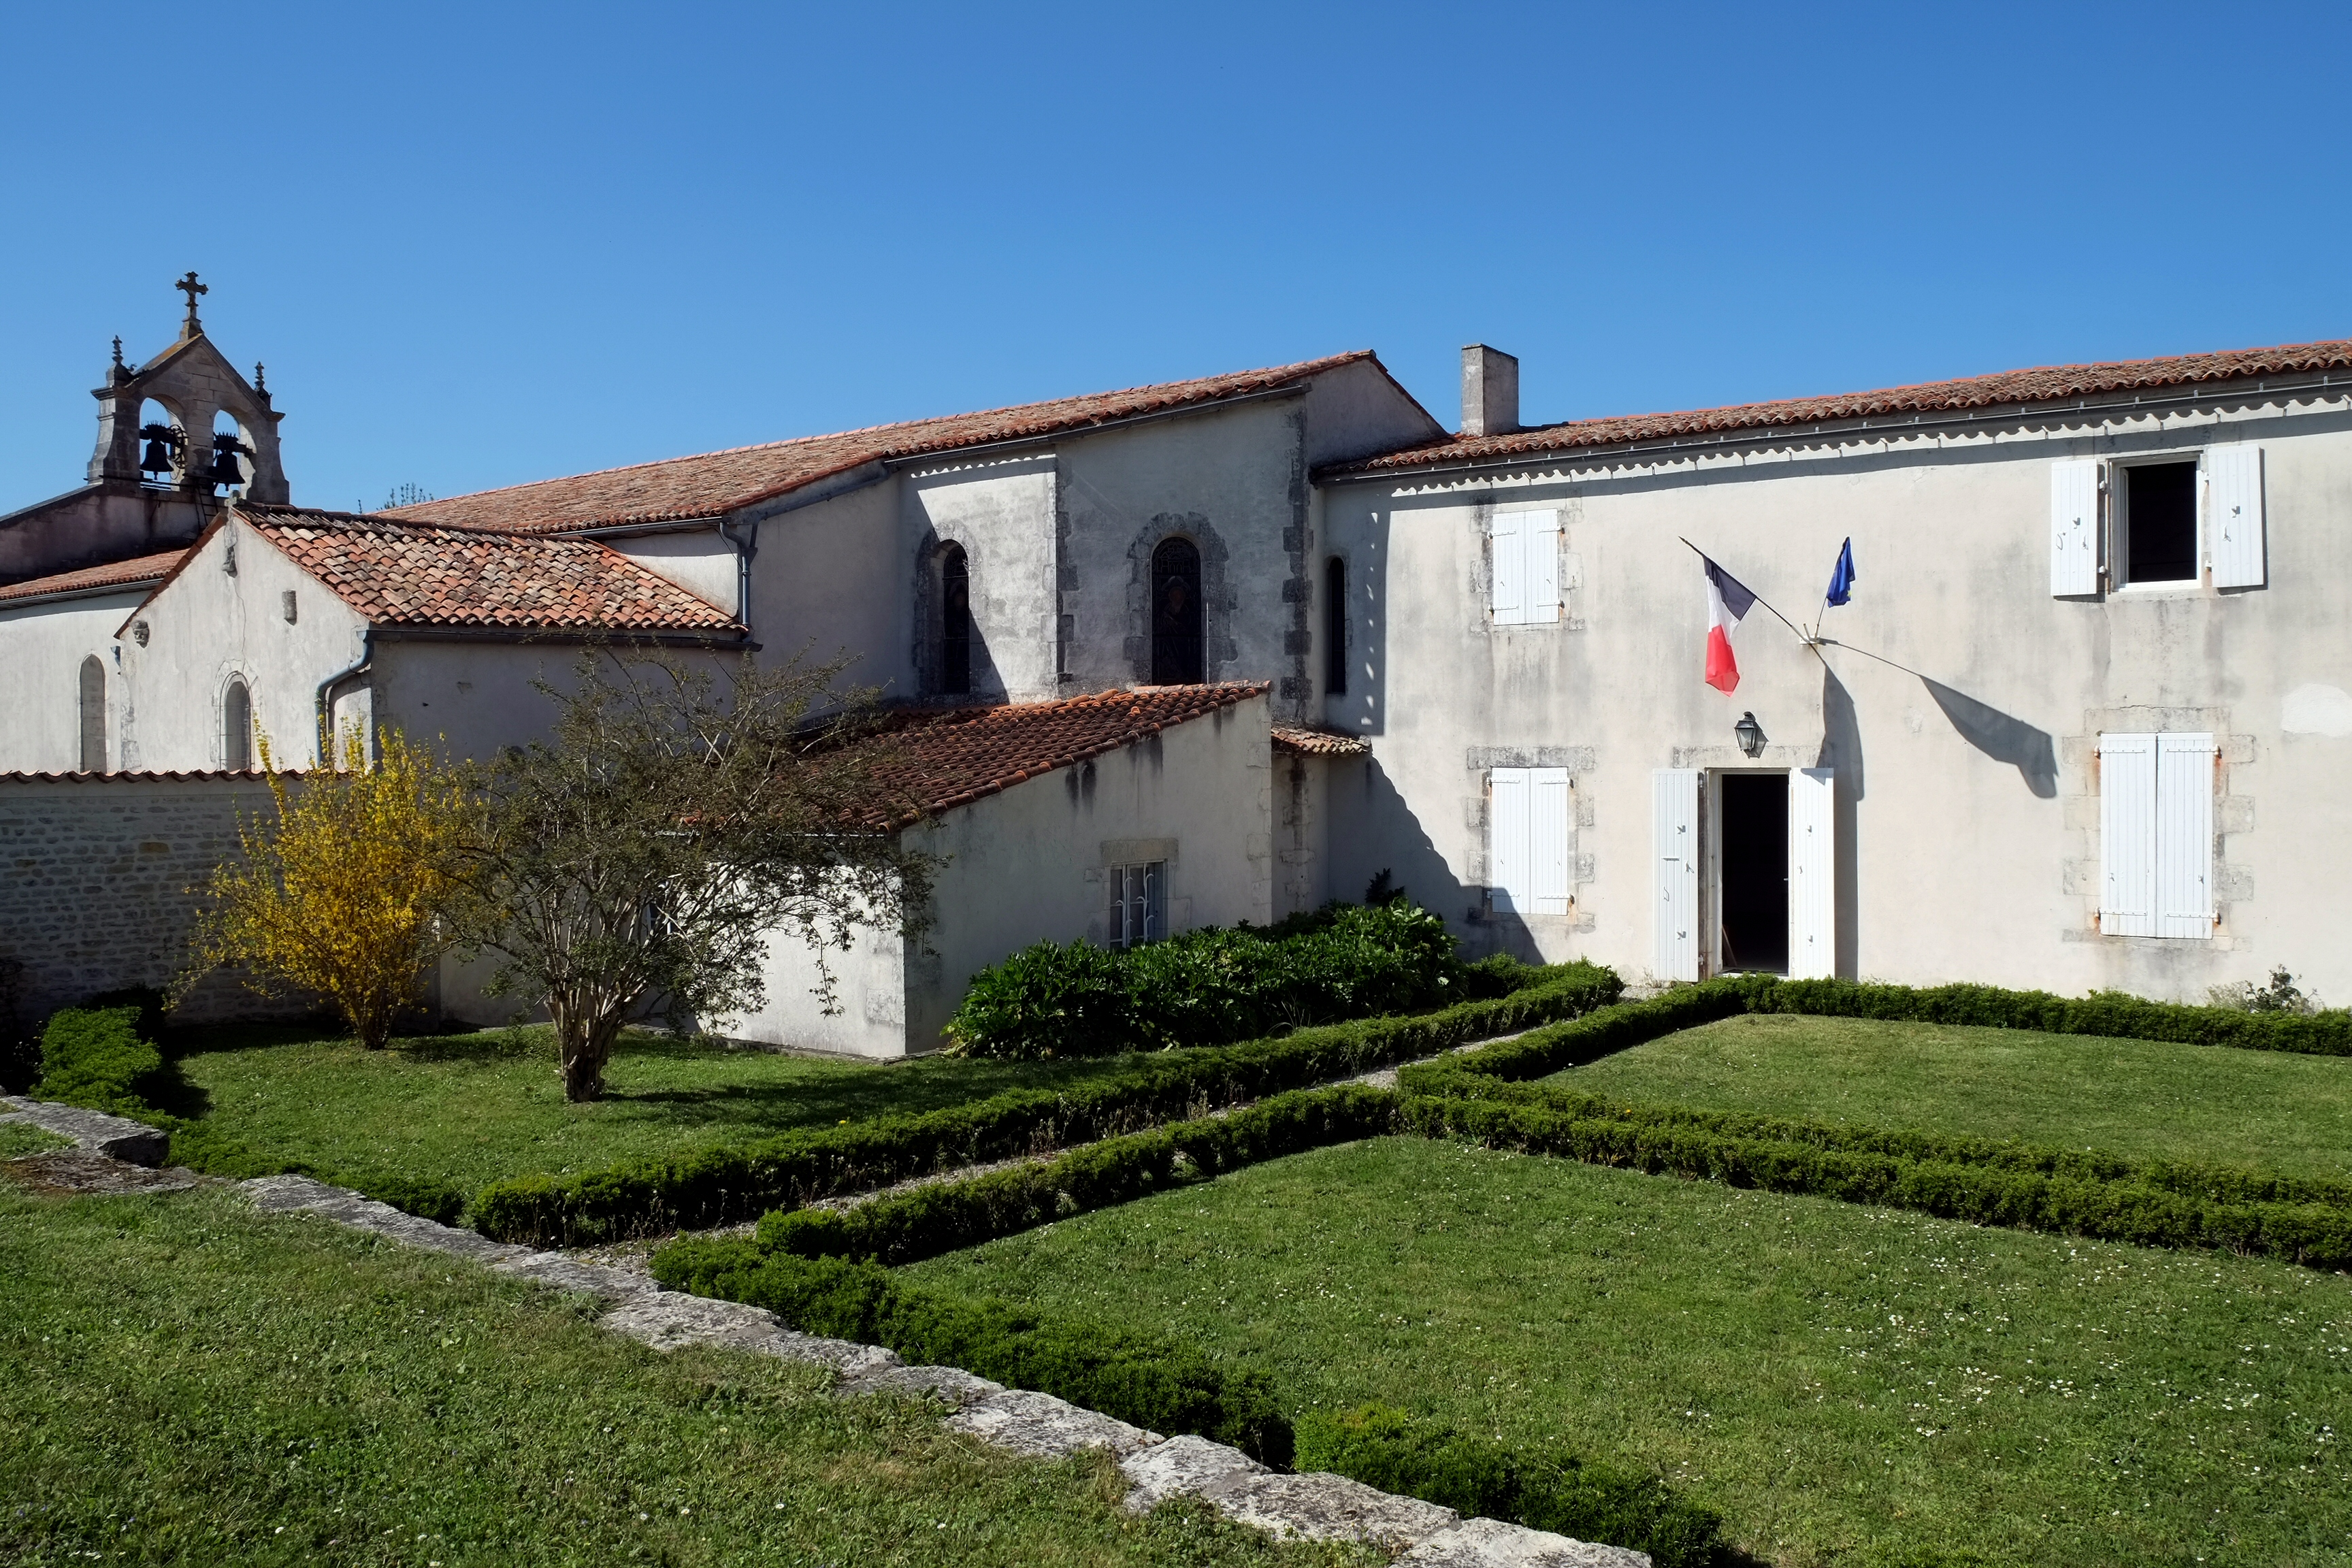 Saint-Médard-d'Aunis